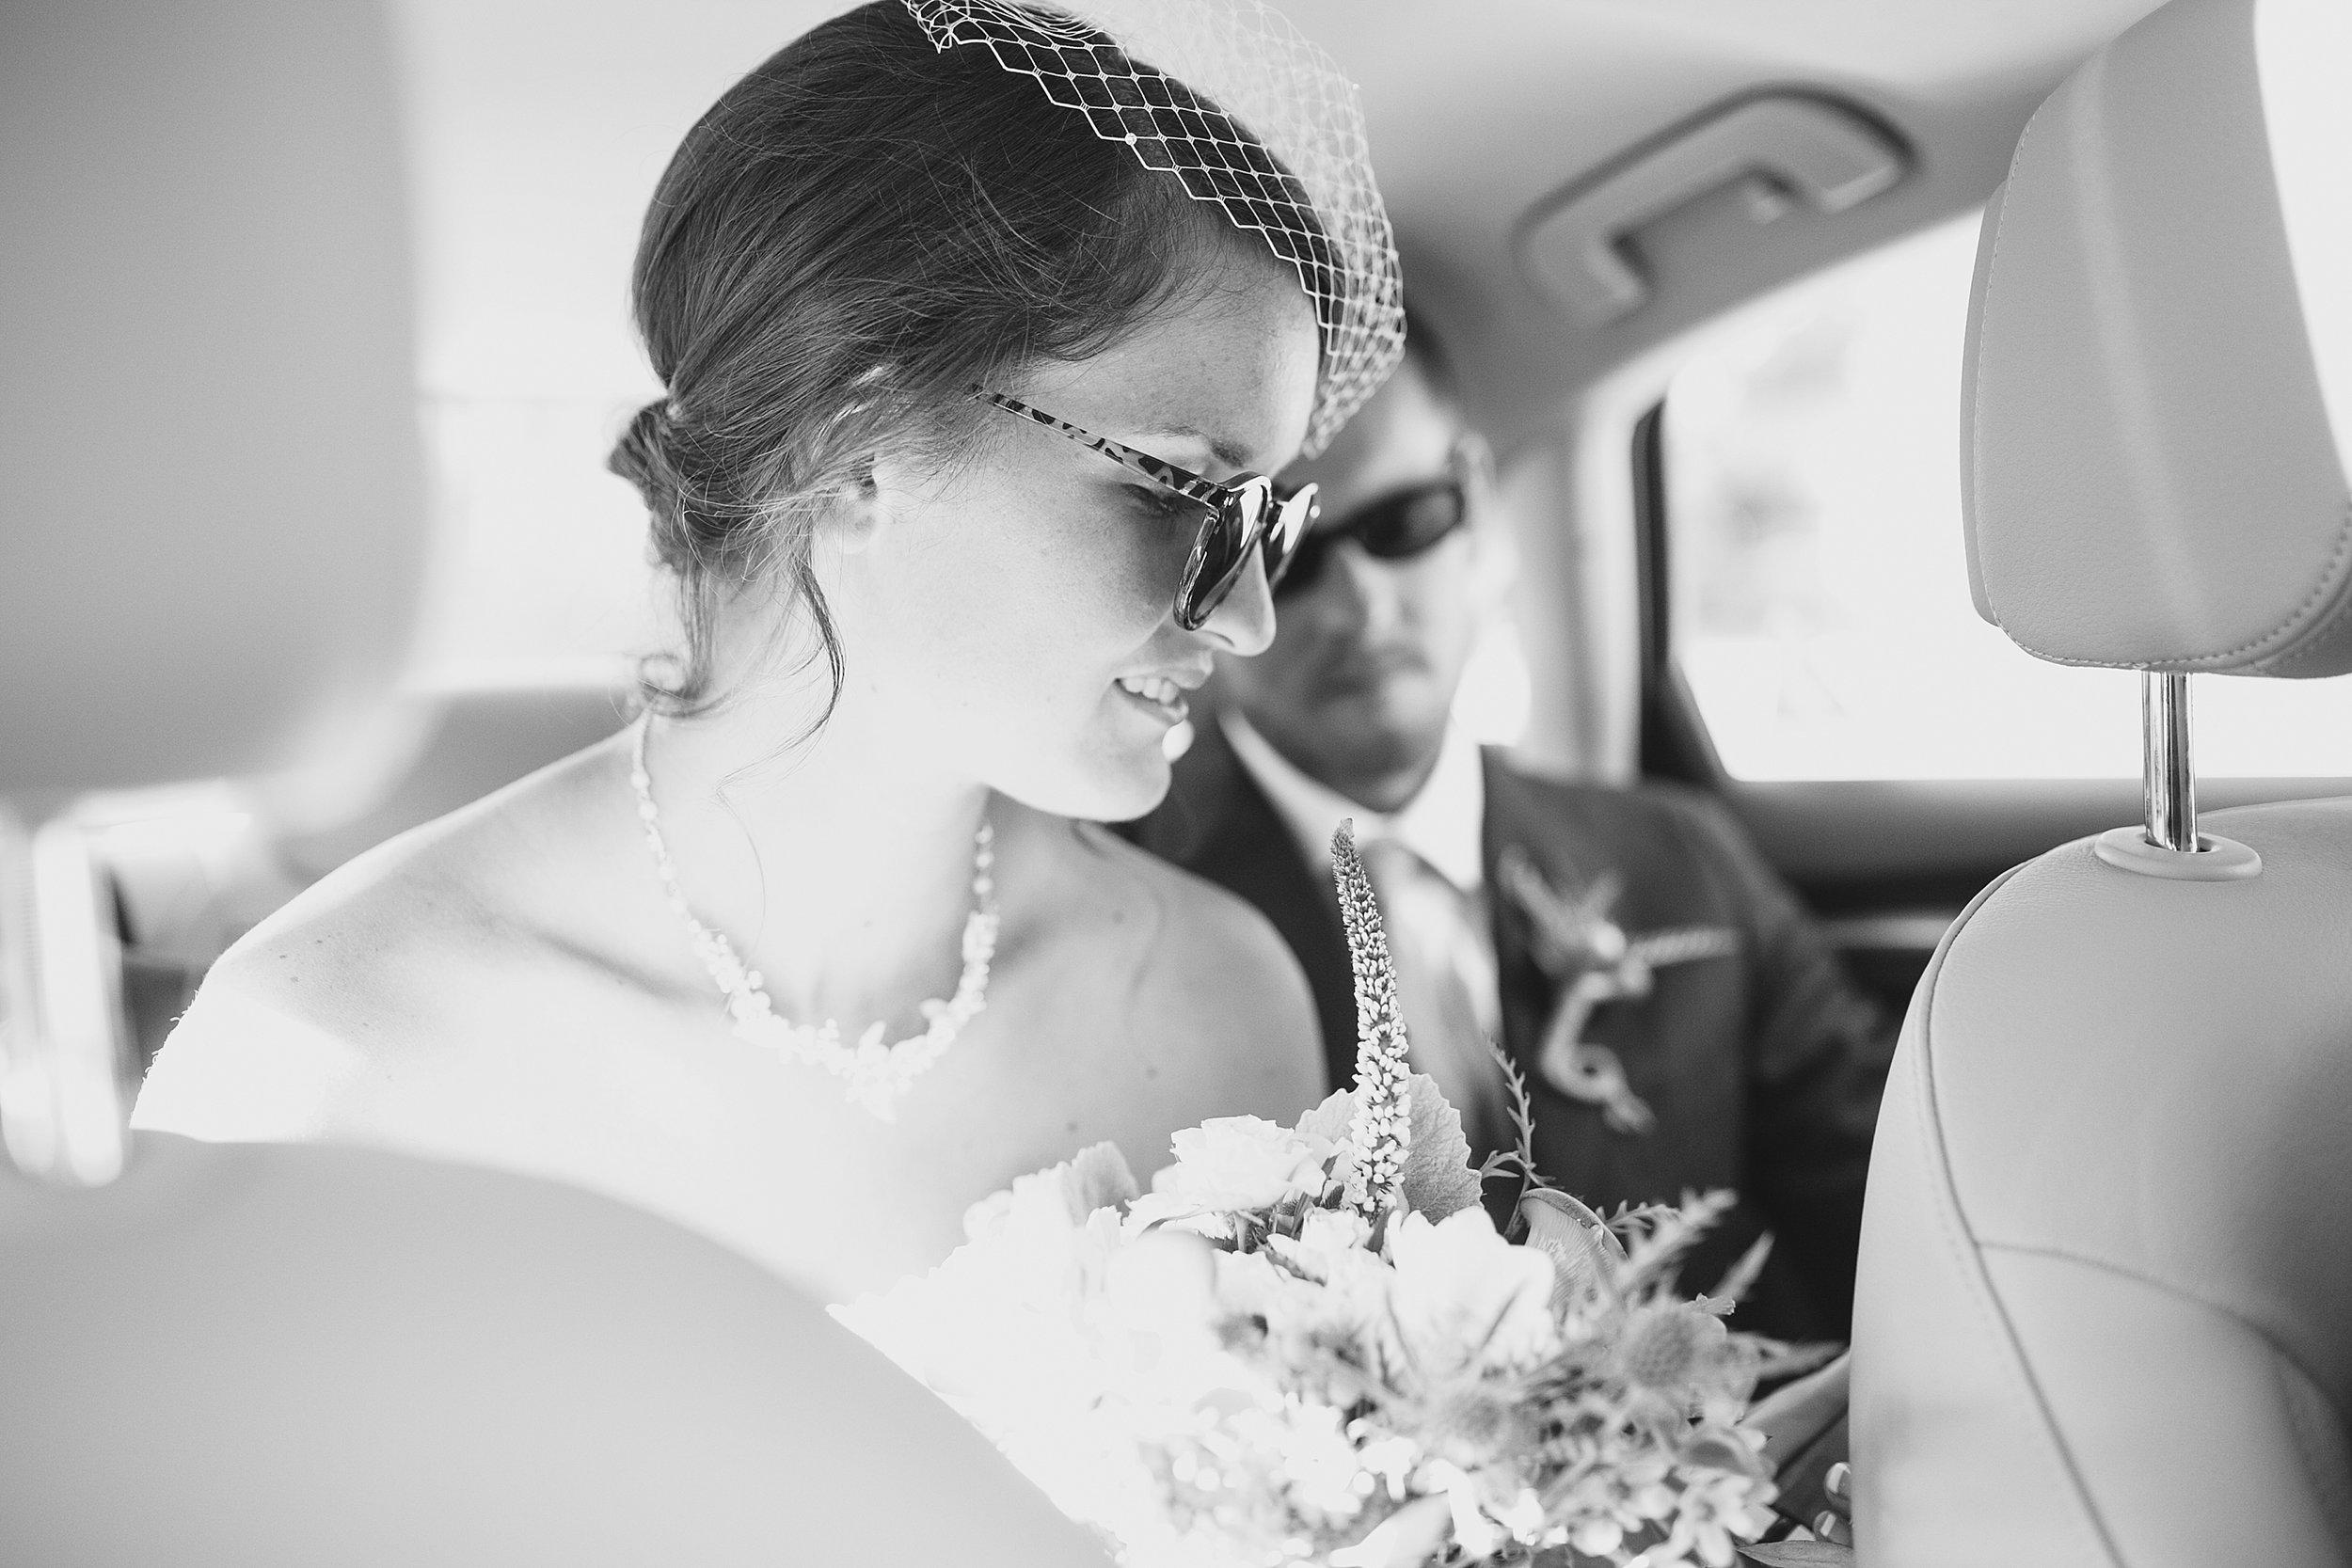 014 los angeles wedding photographer.jpg